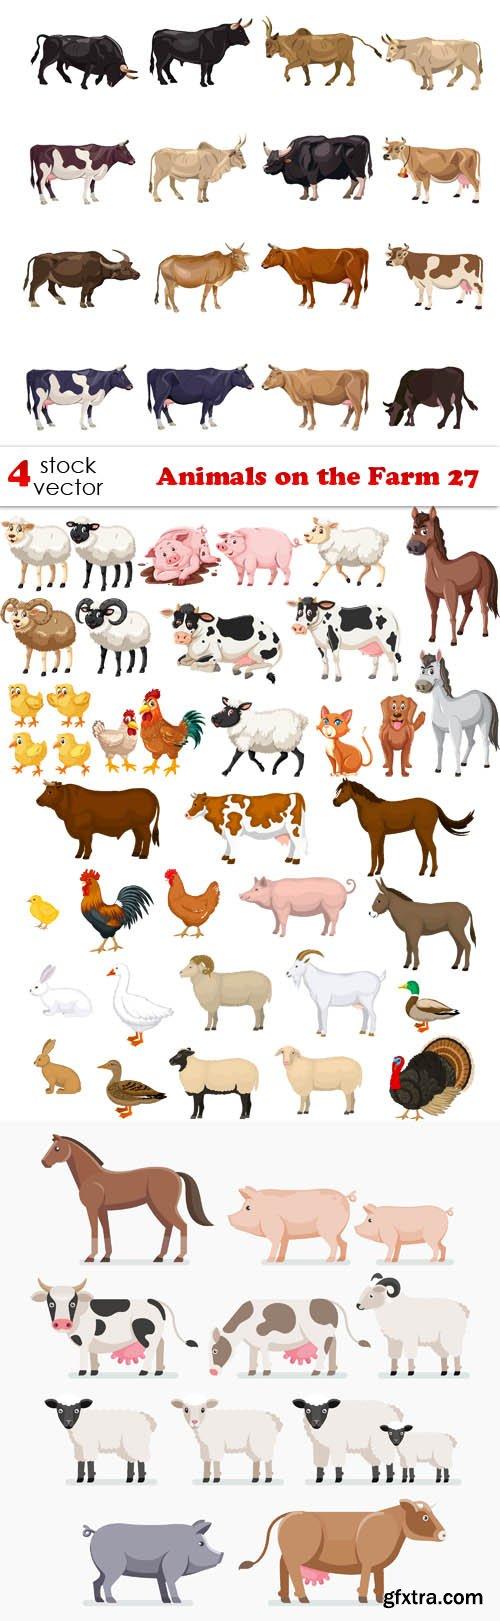 Vectors - Animals on the Farm 27